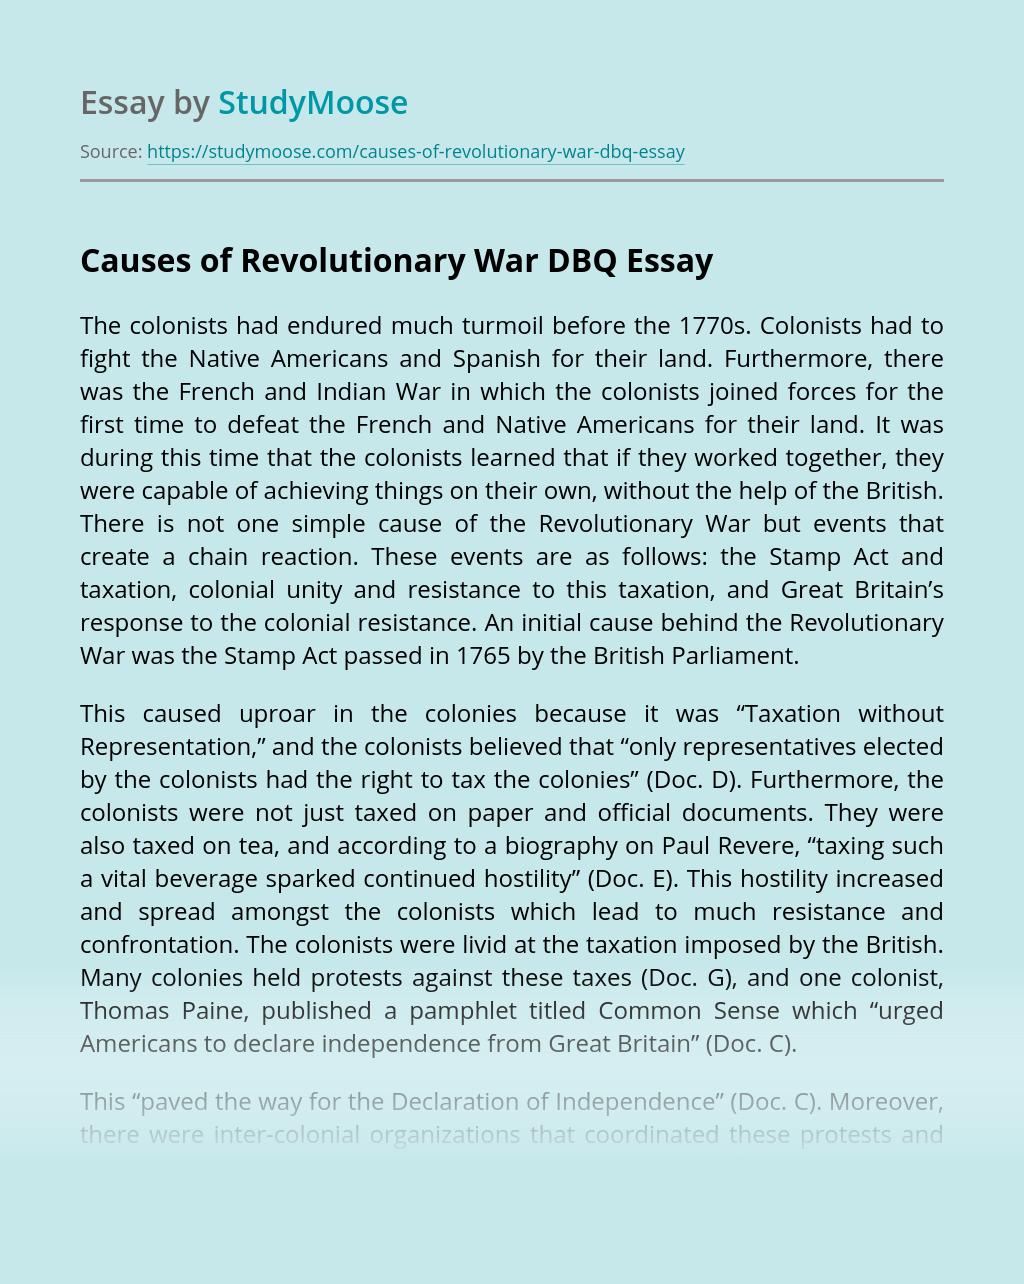 Causes of Revolutionary War DBQ